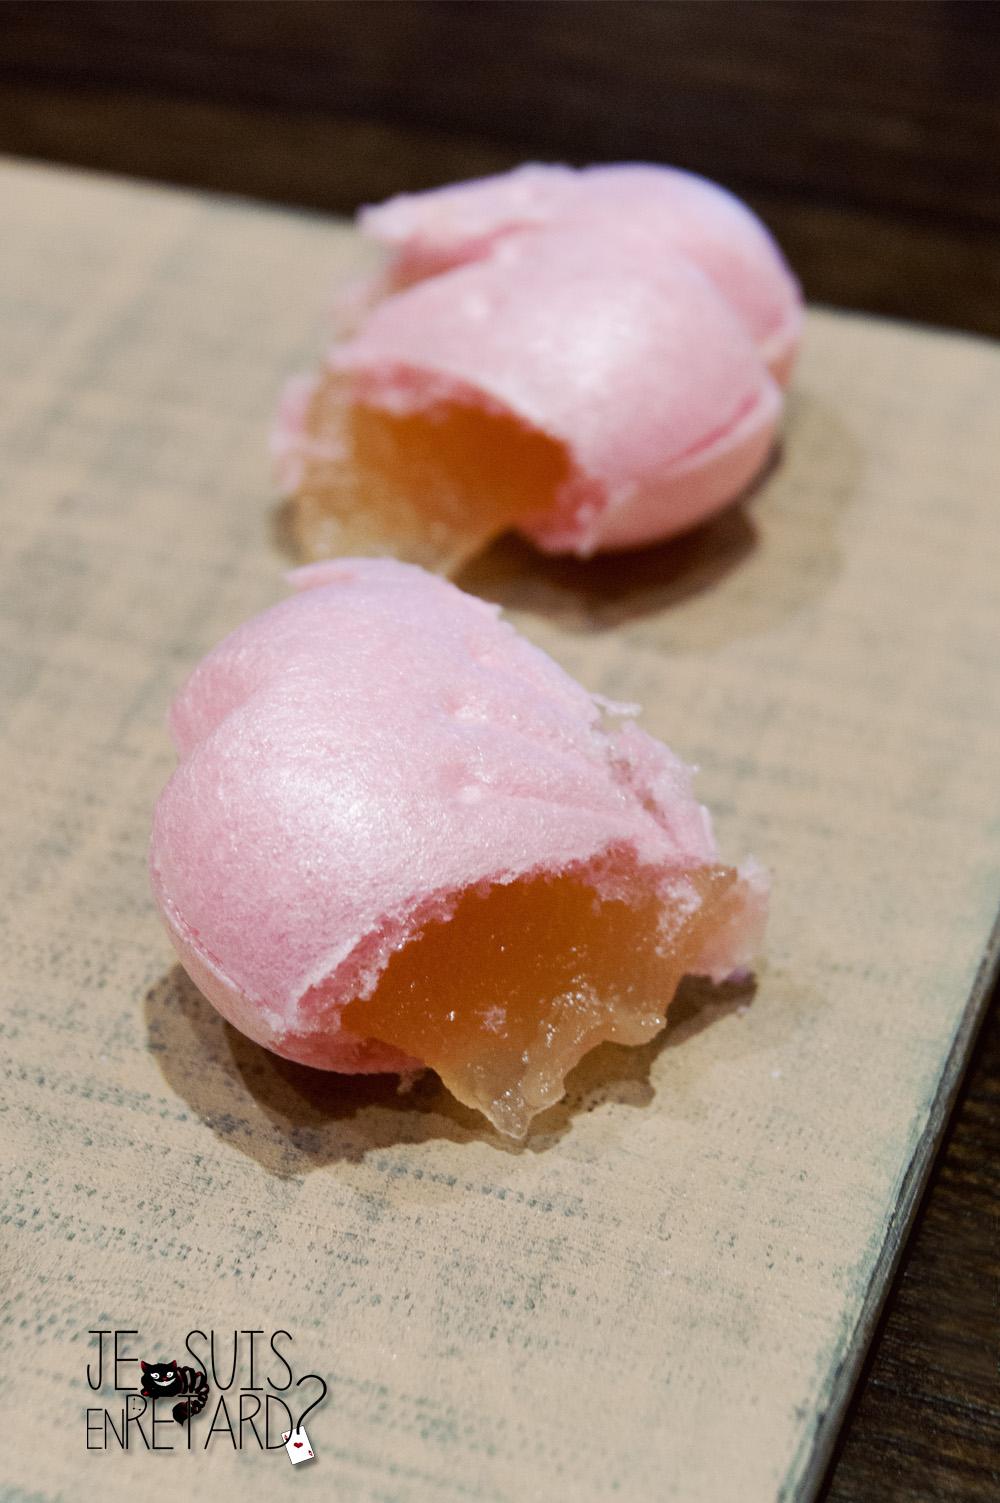 Toraya 4 - Pâtisserie japonaise - pintrerest